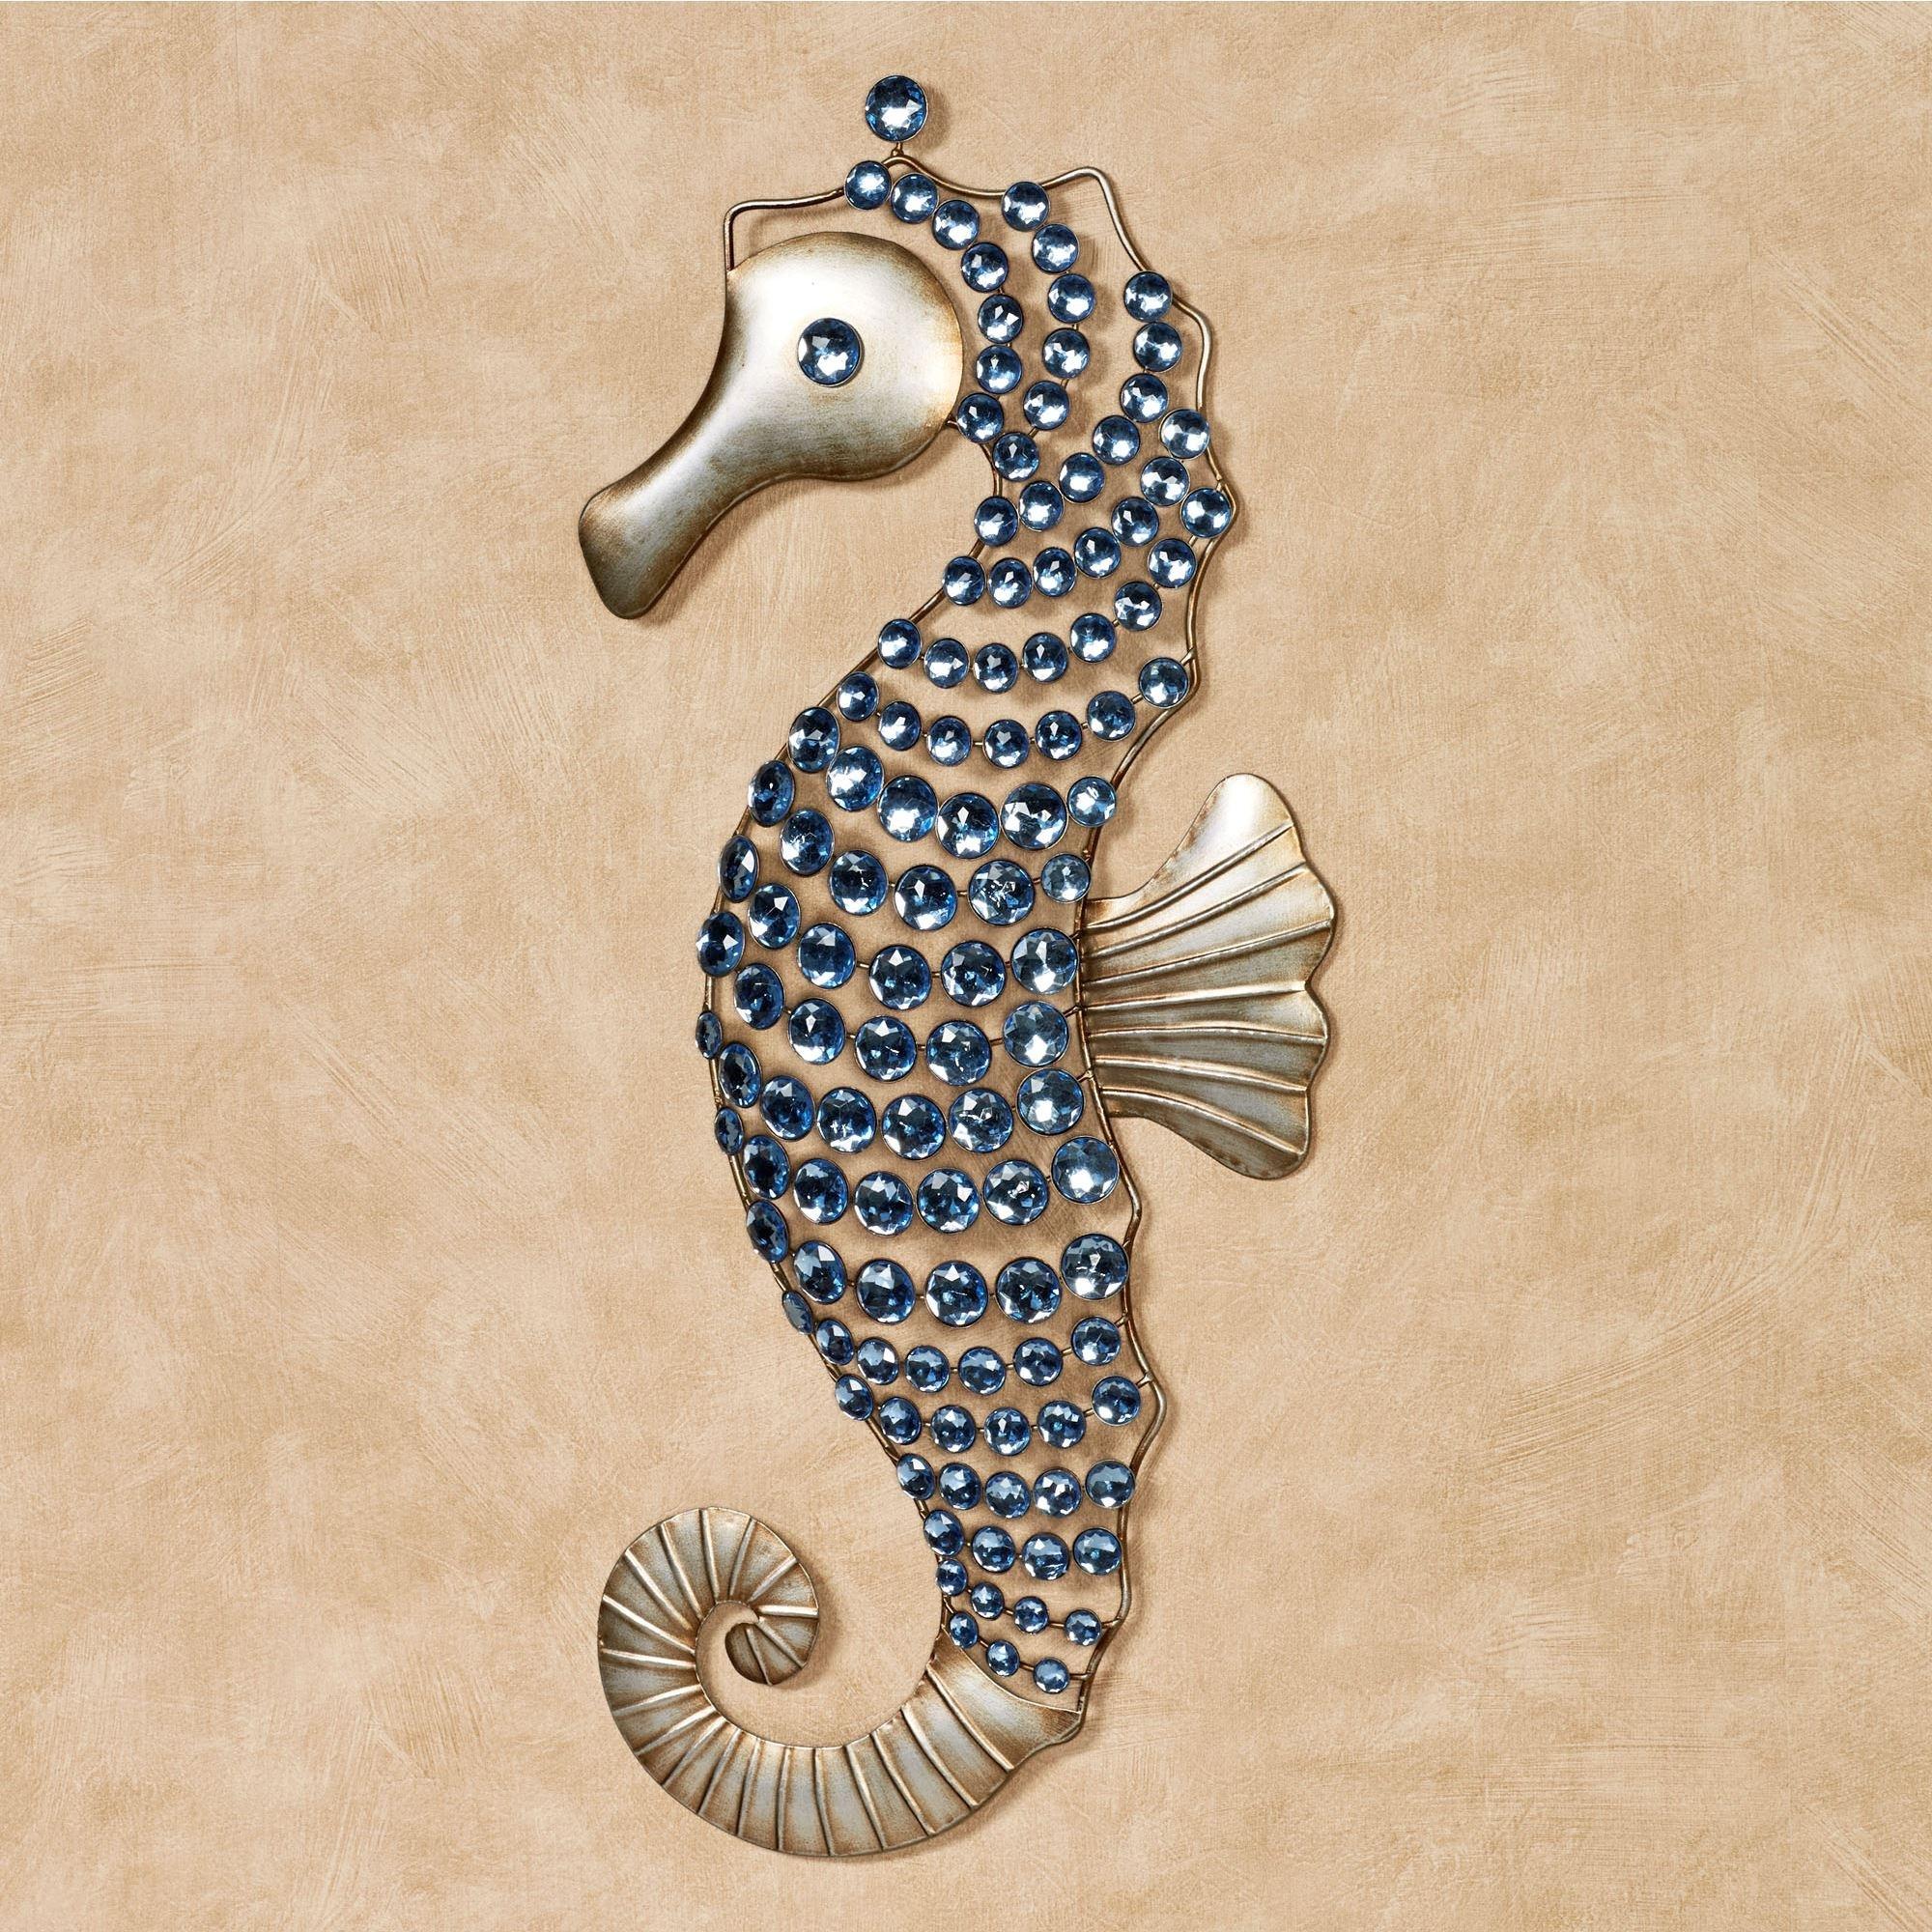 Sea Life Mural Metal Wall Art Blue Collar Welding Llc Remarkable regarding Sea Life Wall Art (Image 15 of 20)